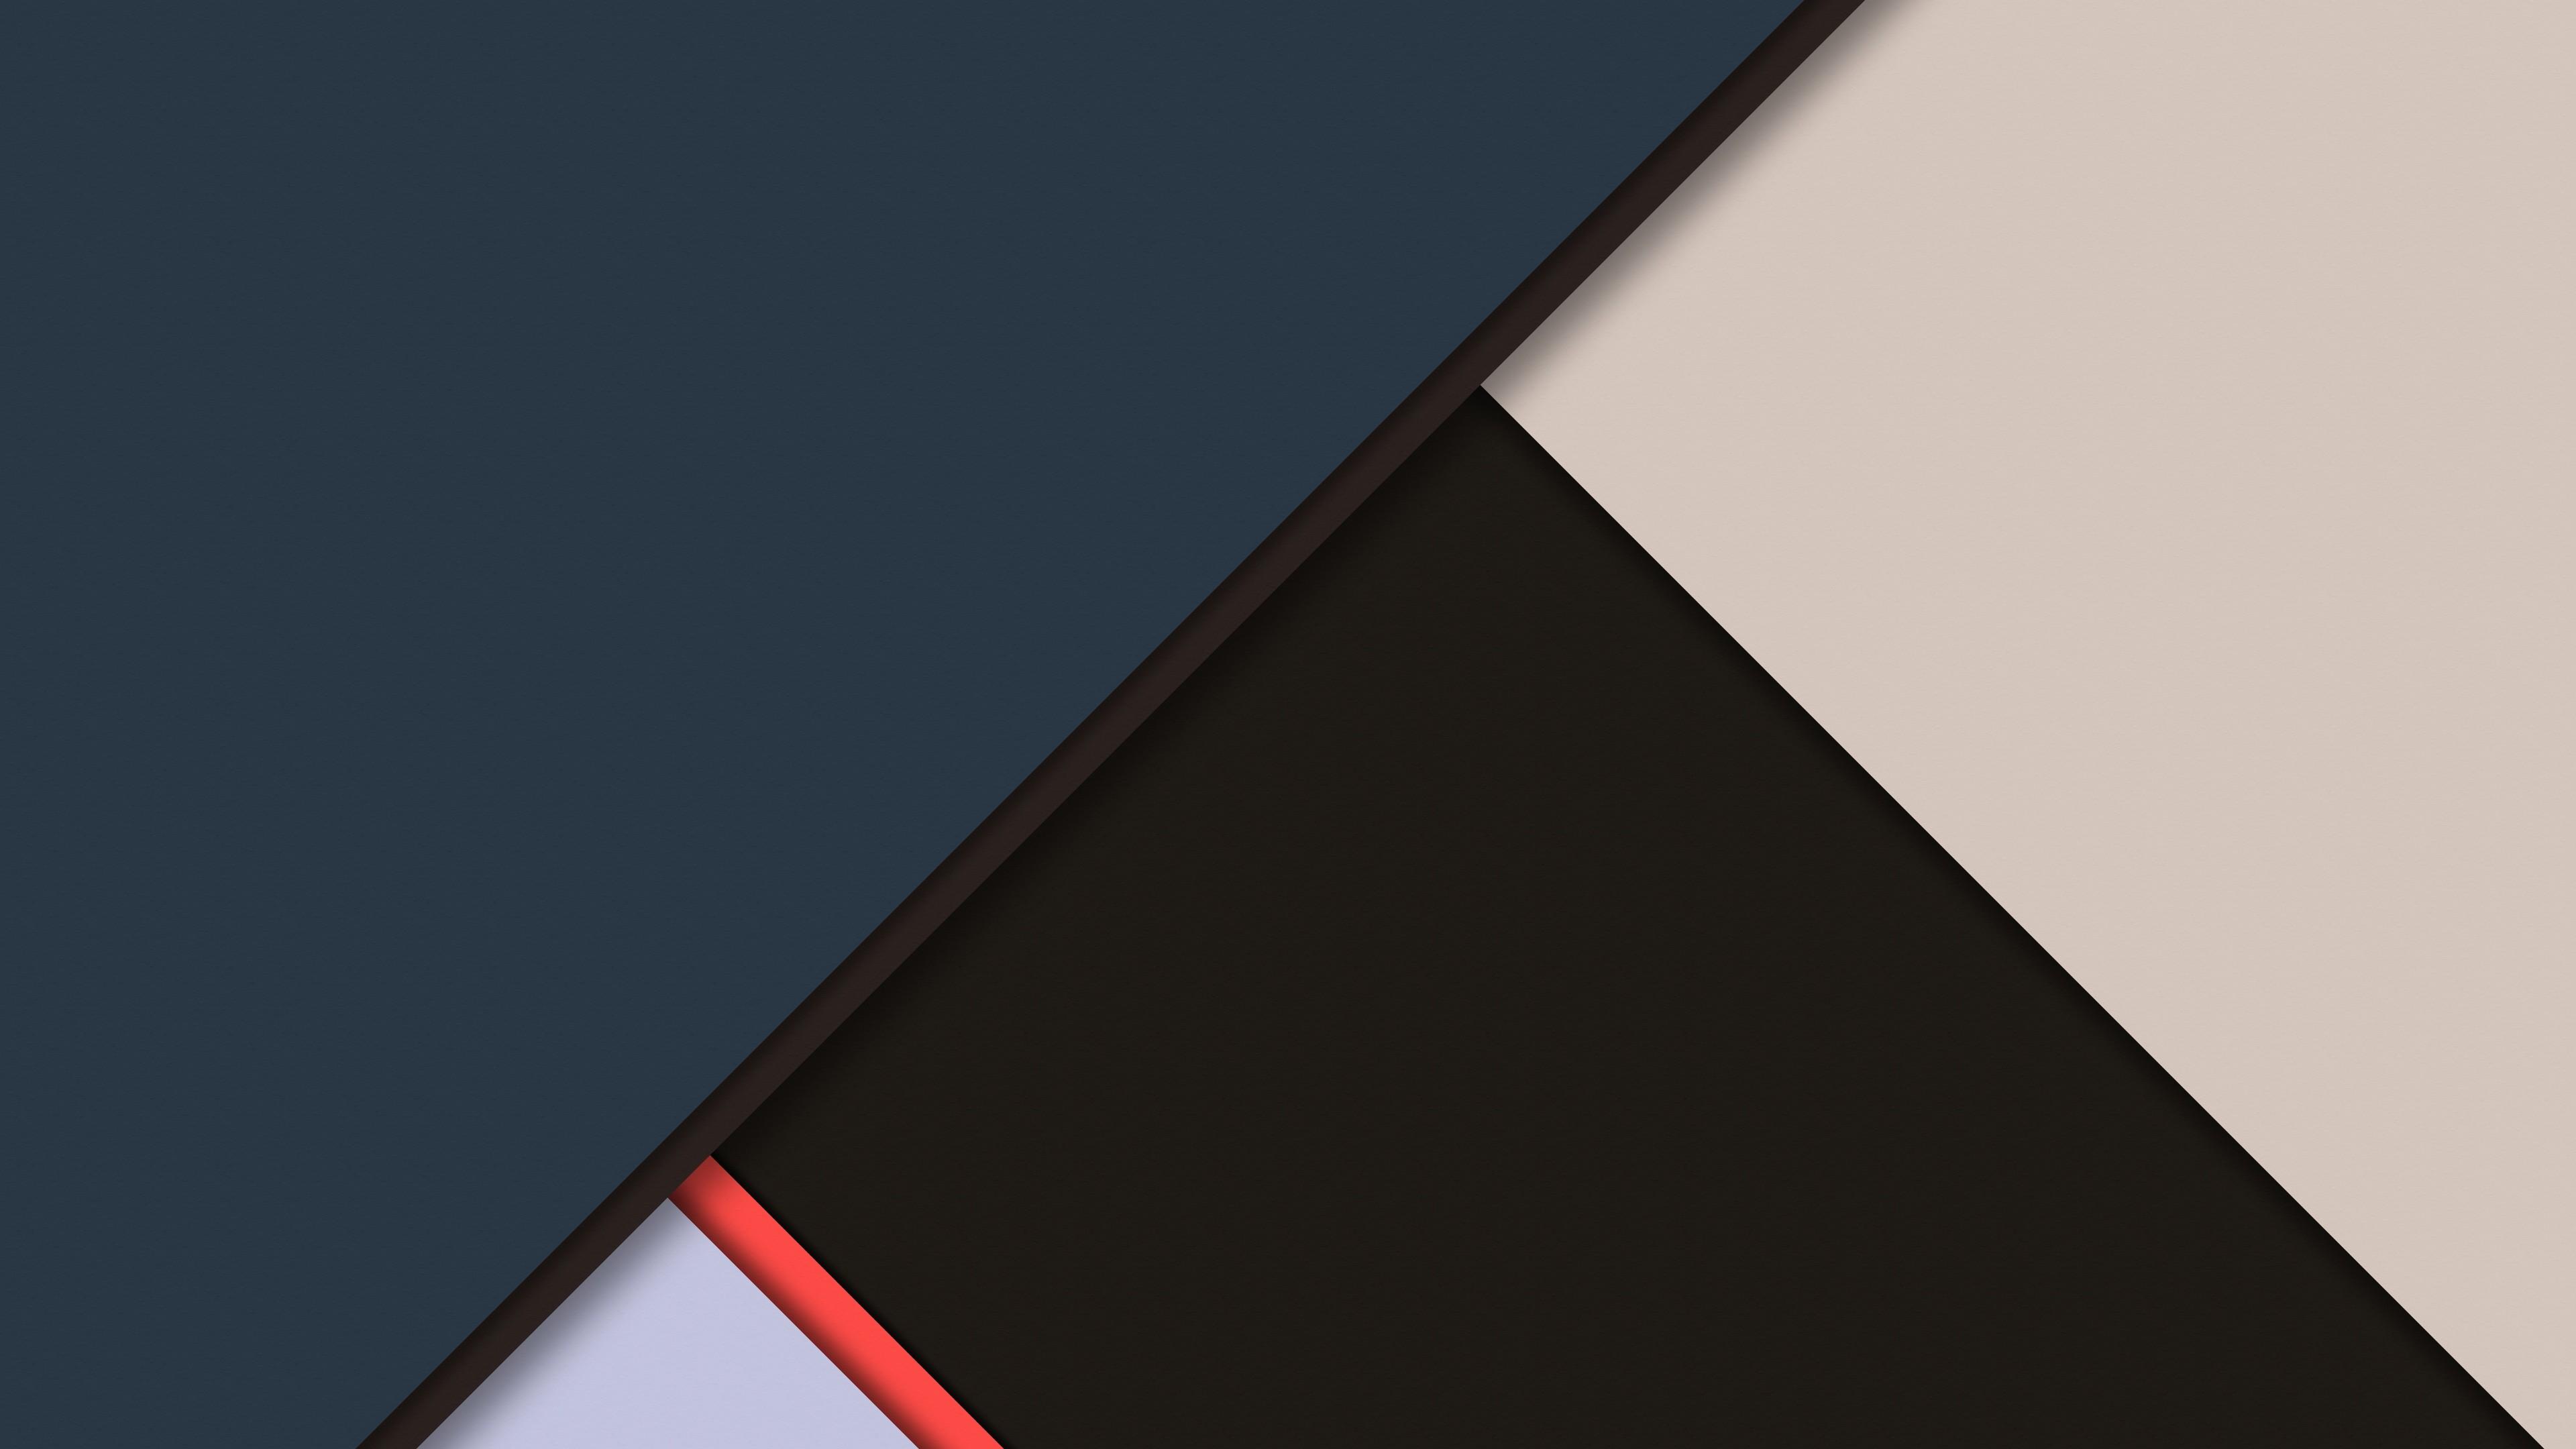 material style 5k 1539370696 - Material Style 5k - material wallpapers, hd-wallpapers, design wallpapers, artist wallpapers, abstract wallpapers, 5k wallpapers, 4k-wallpapers